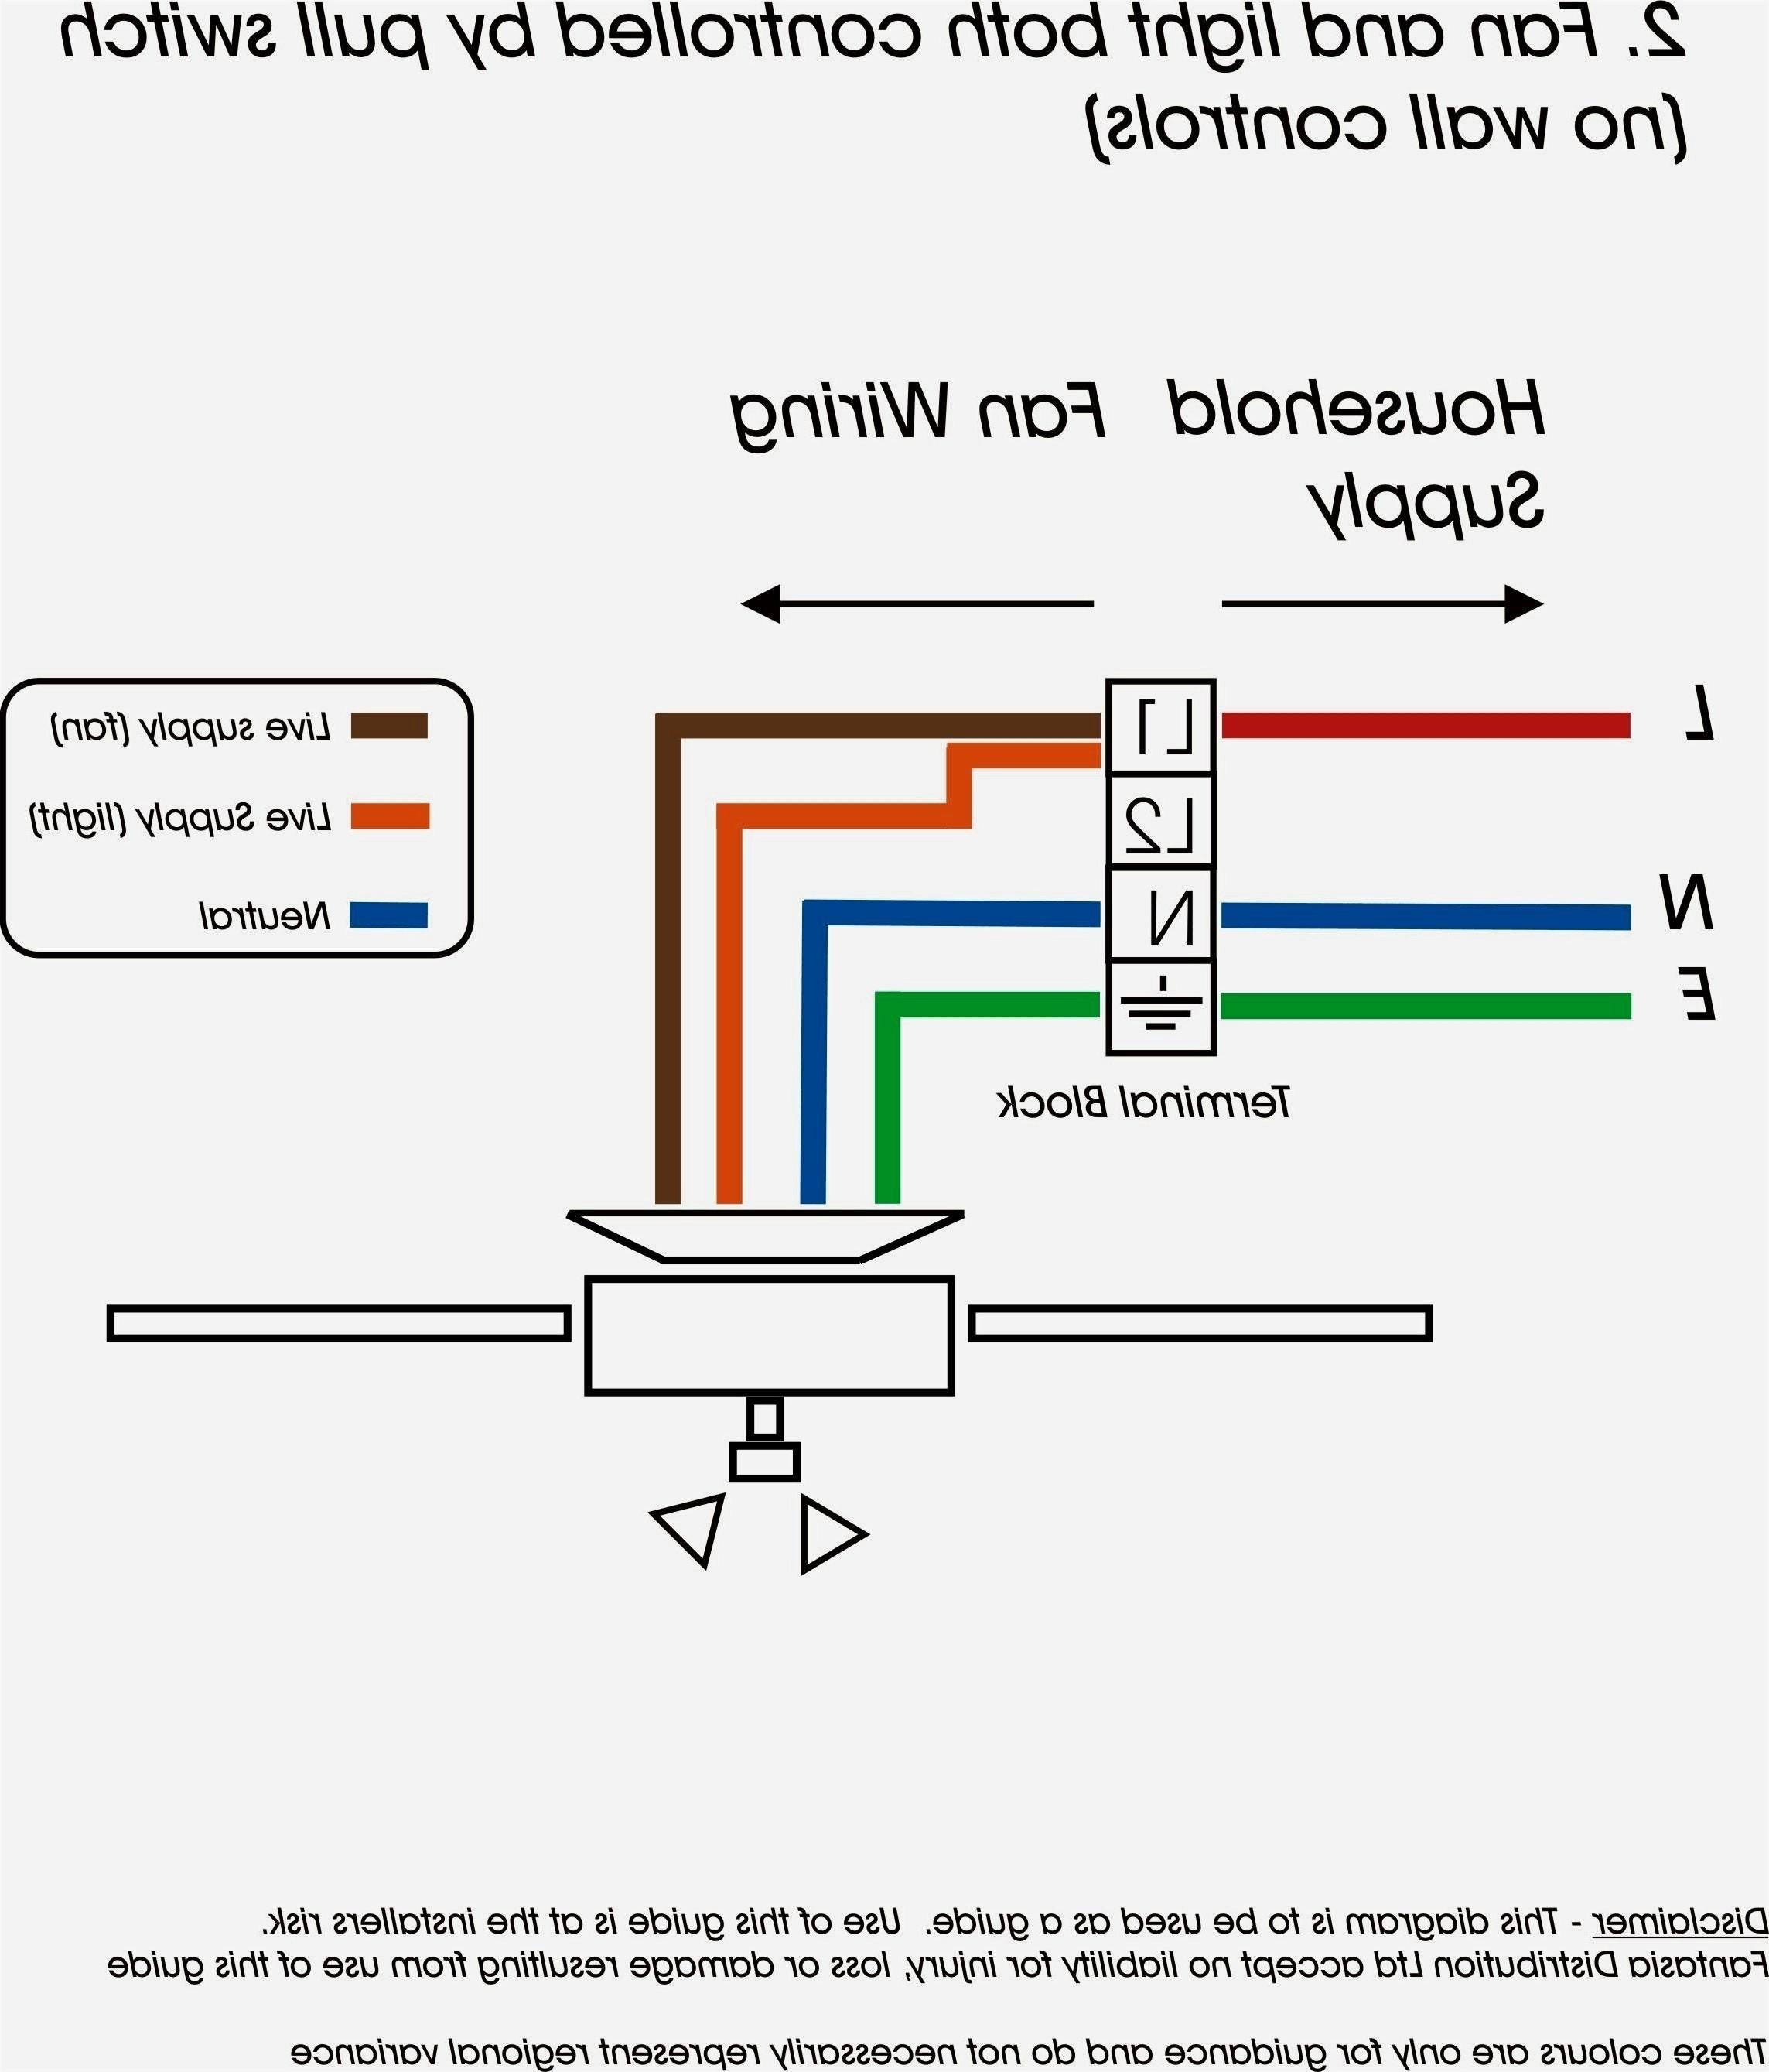 2 way wiring diagram Collection-Wiring Diagram 2 Way Light Switch Australia Best Arlec Light Switch Wiring Diagram Australia Wire Center • 1-d